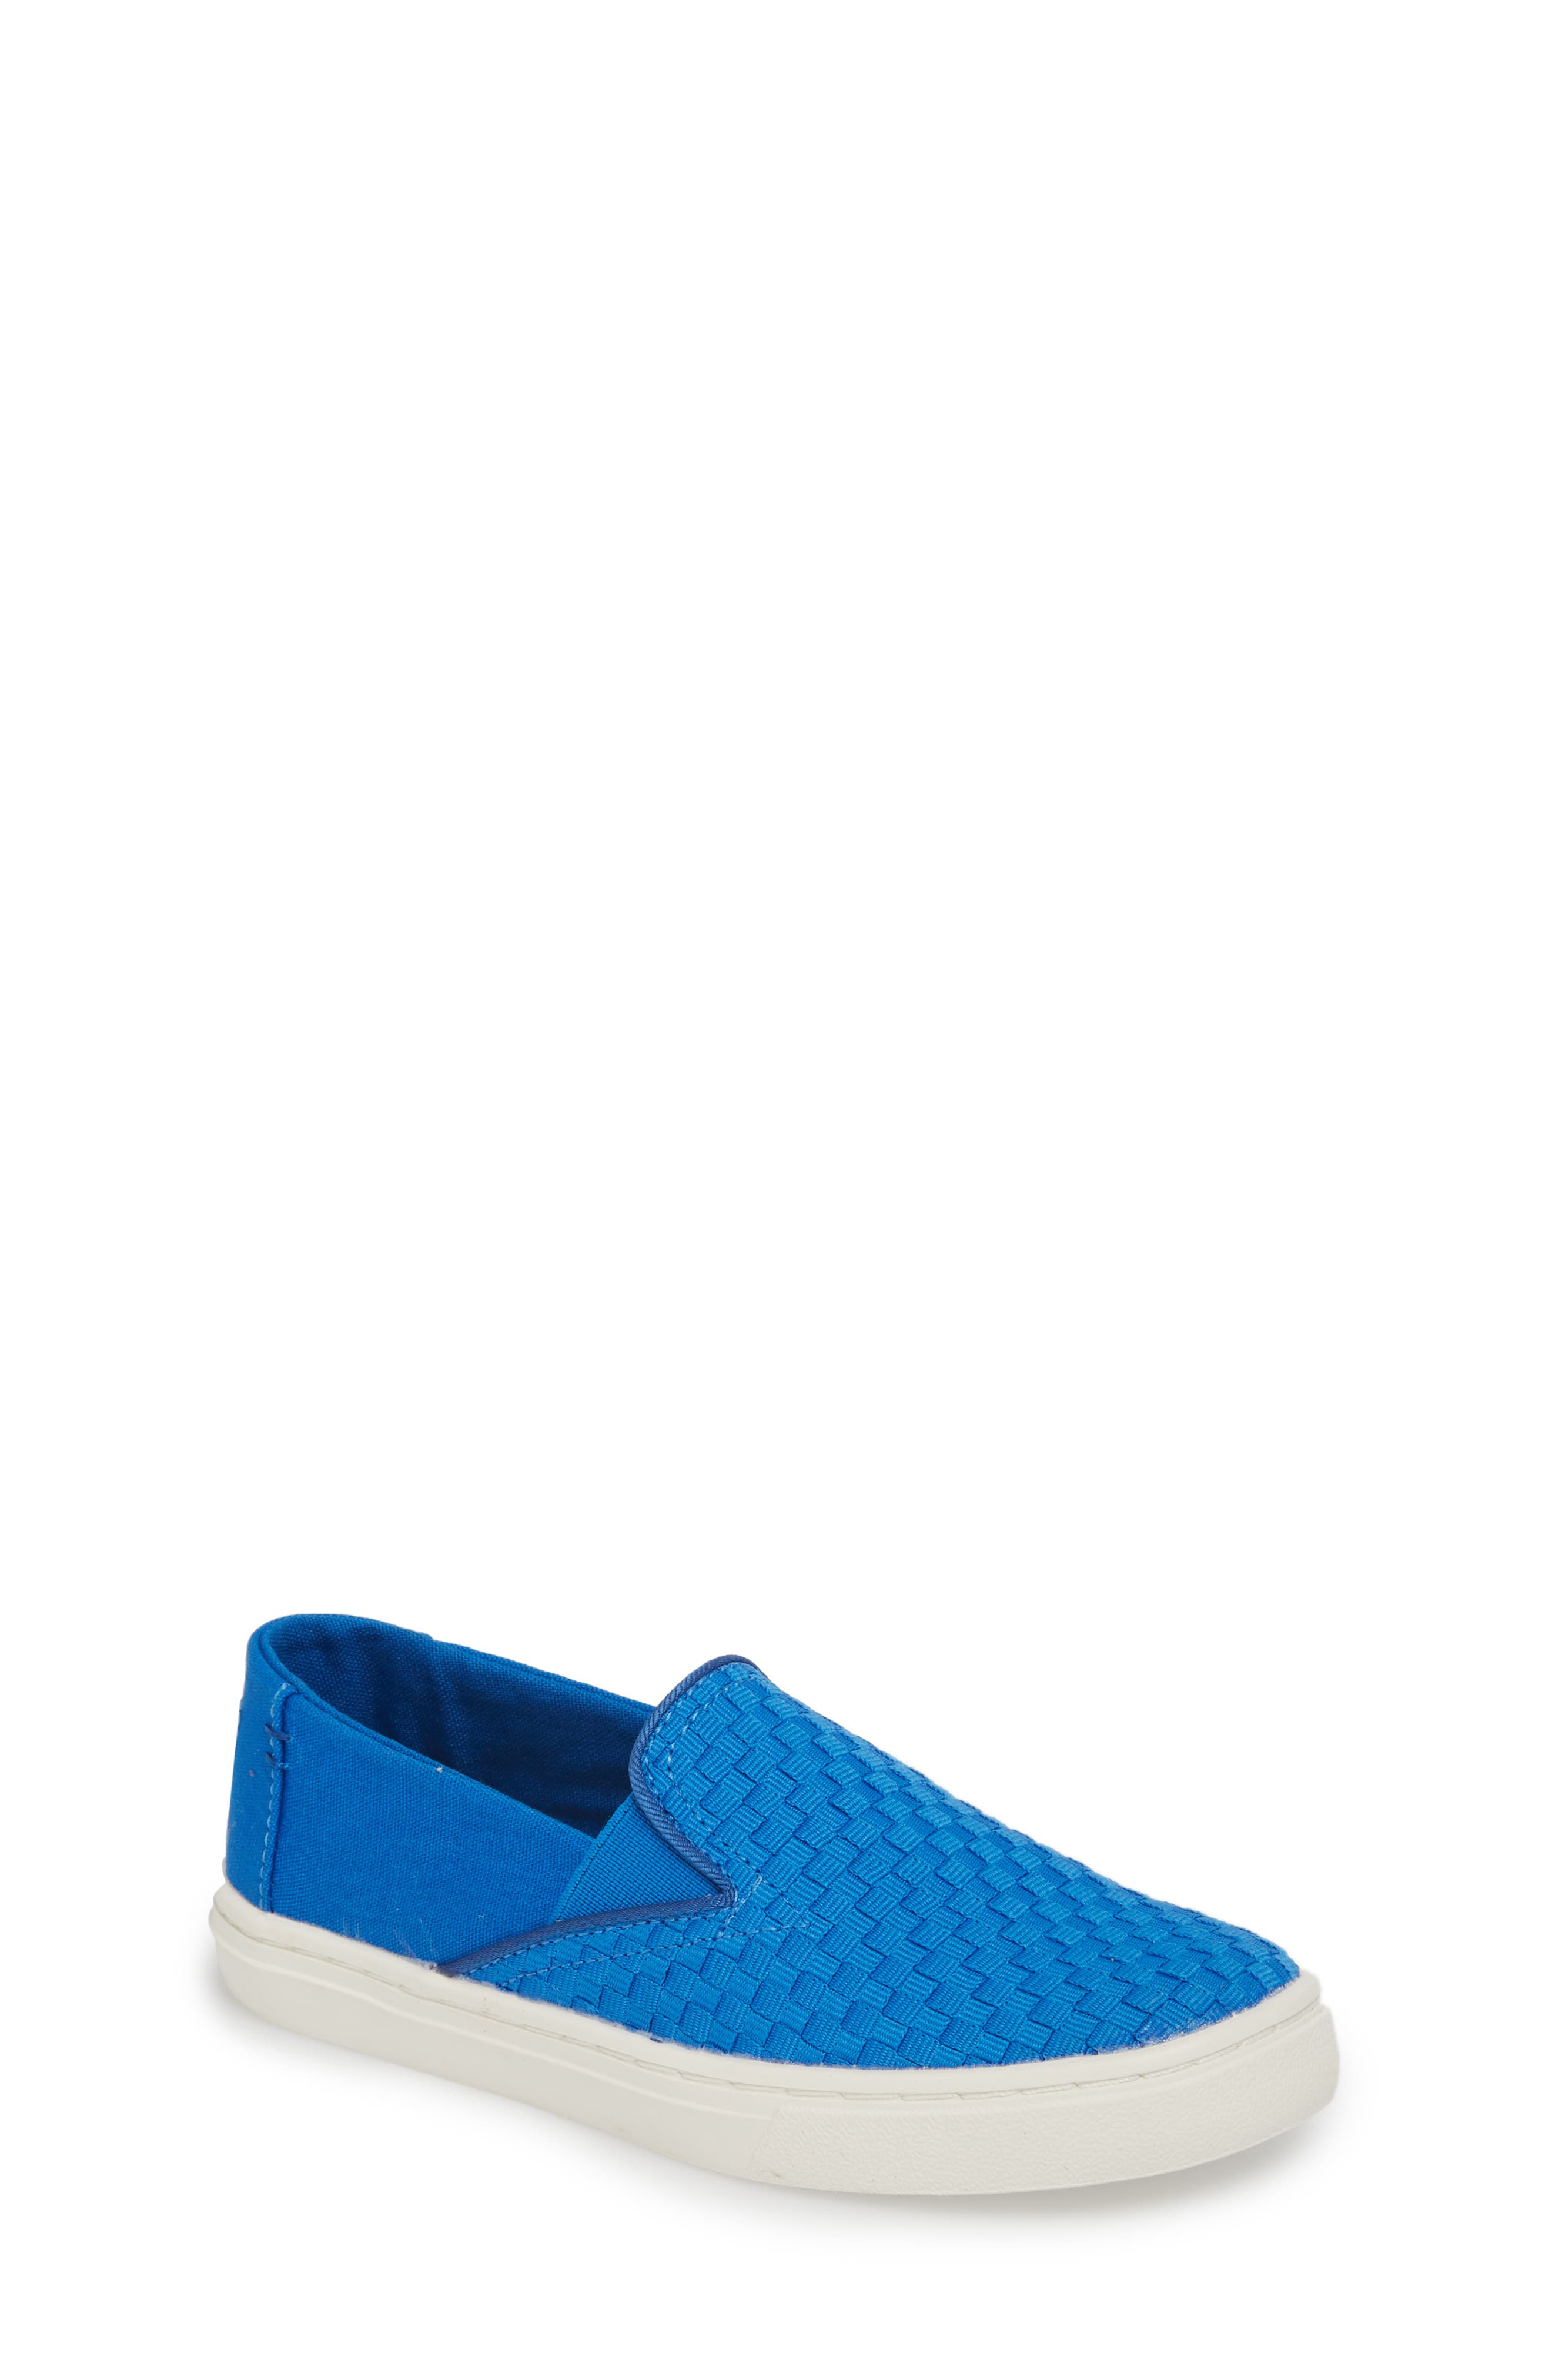 Luca Slip-On Sneaker,                             Main thumbnail 1, color,                             Imperial Blue Basketweave